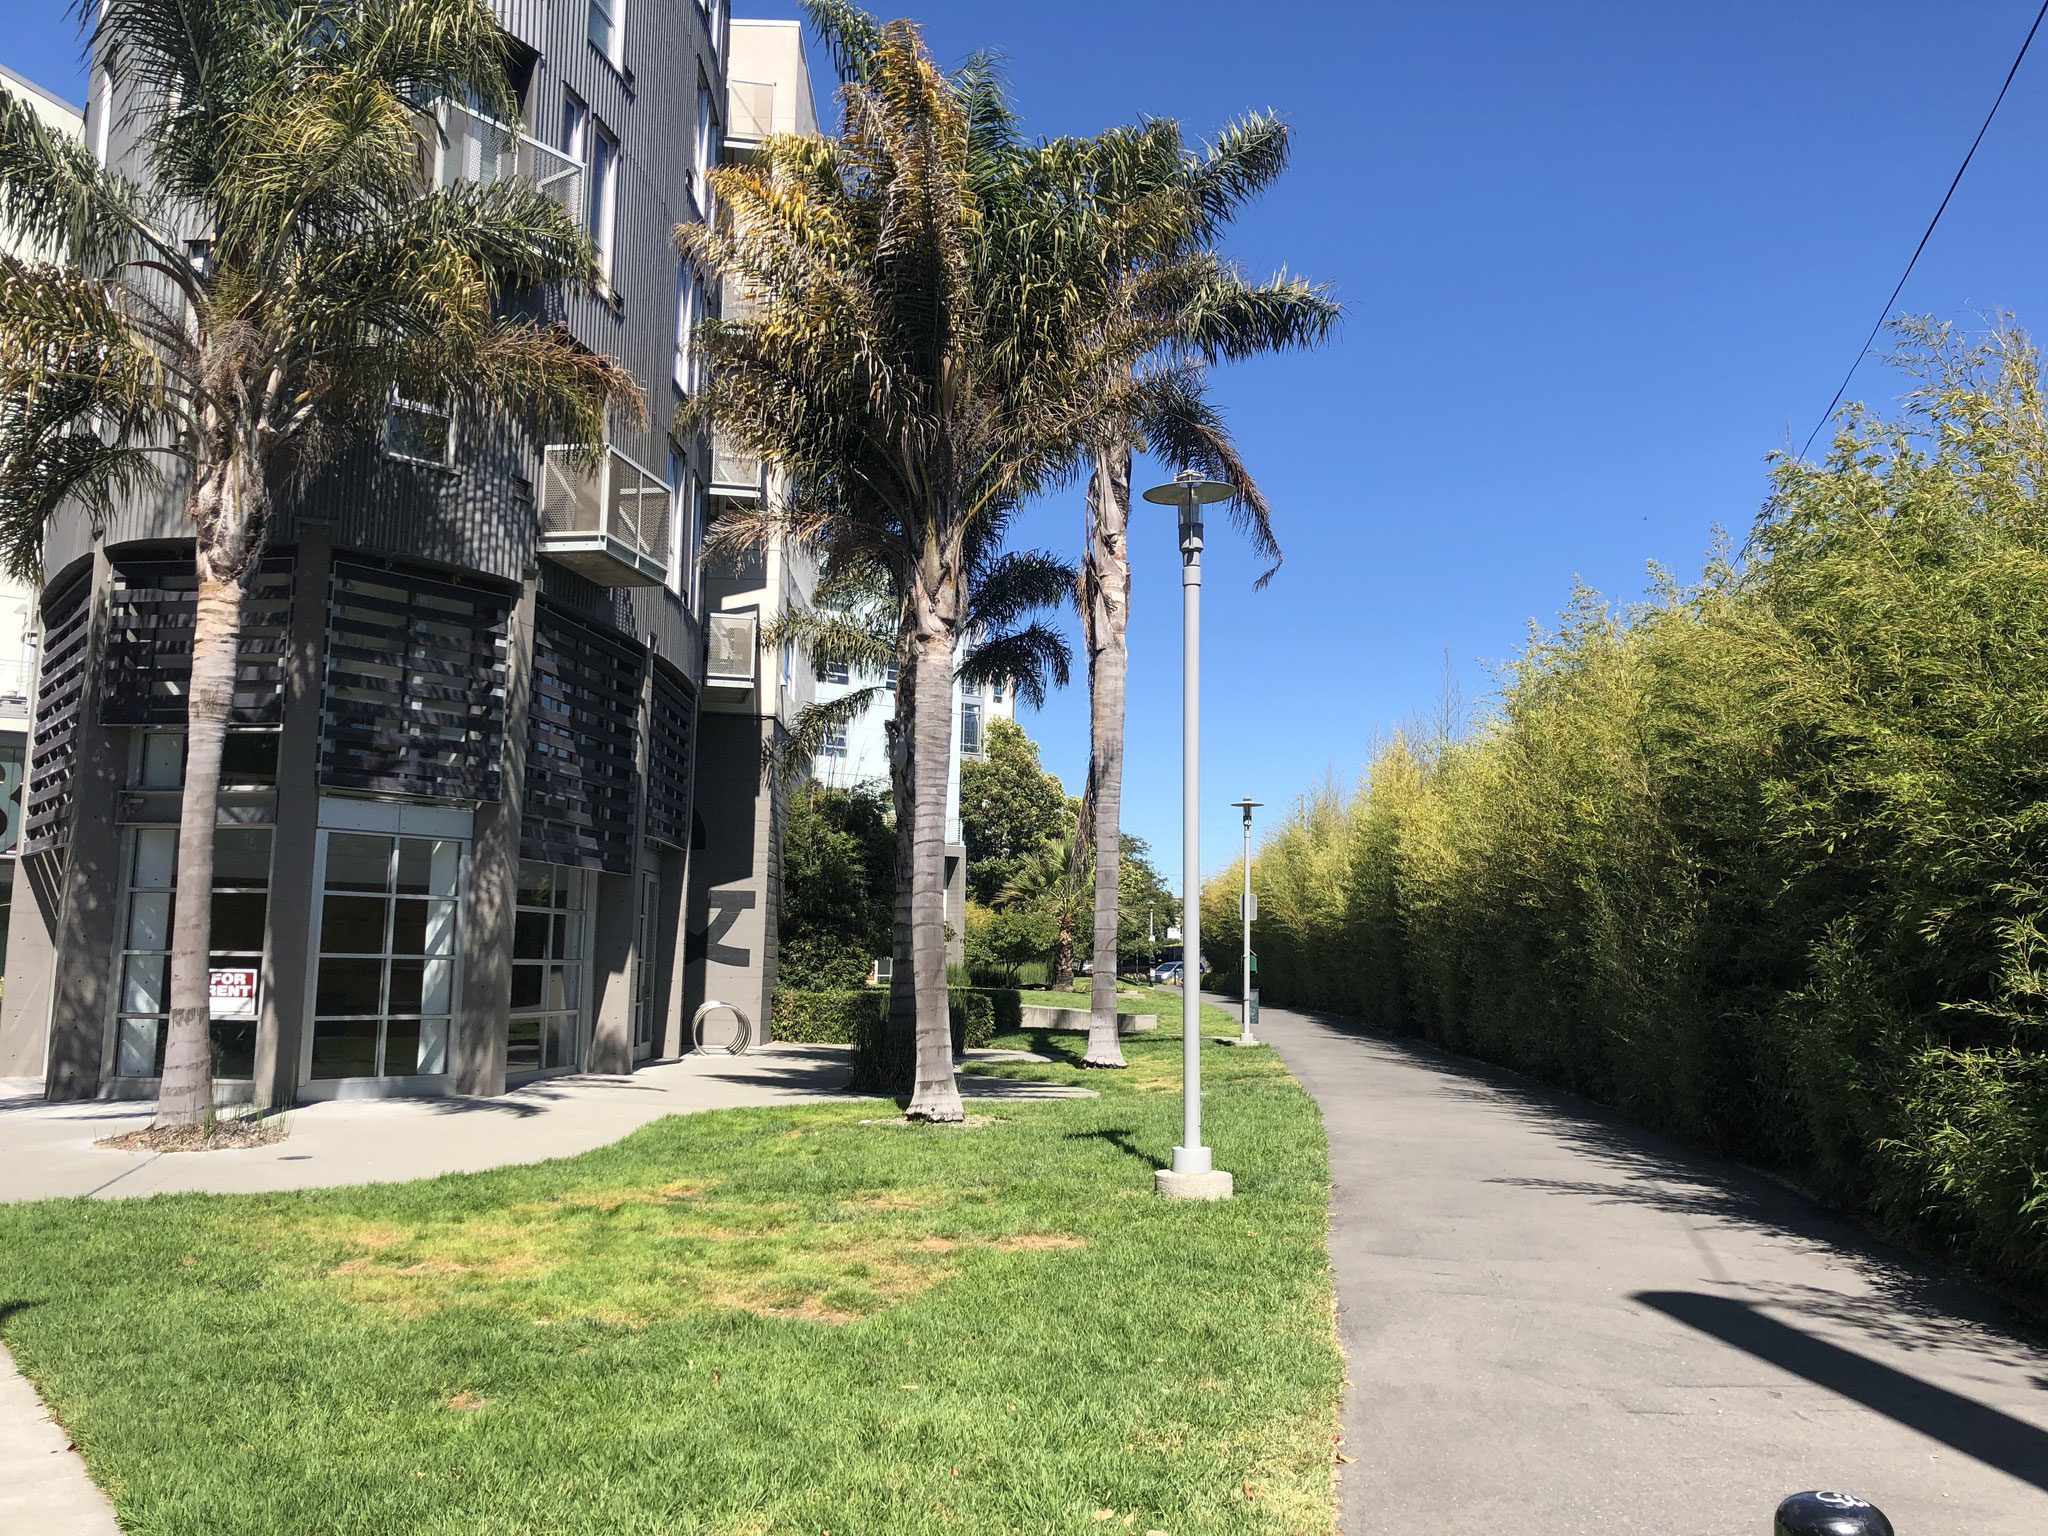 Condo Park Path Area